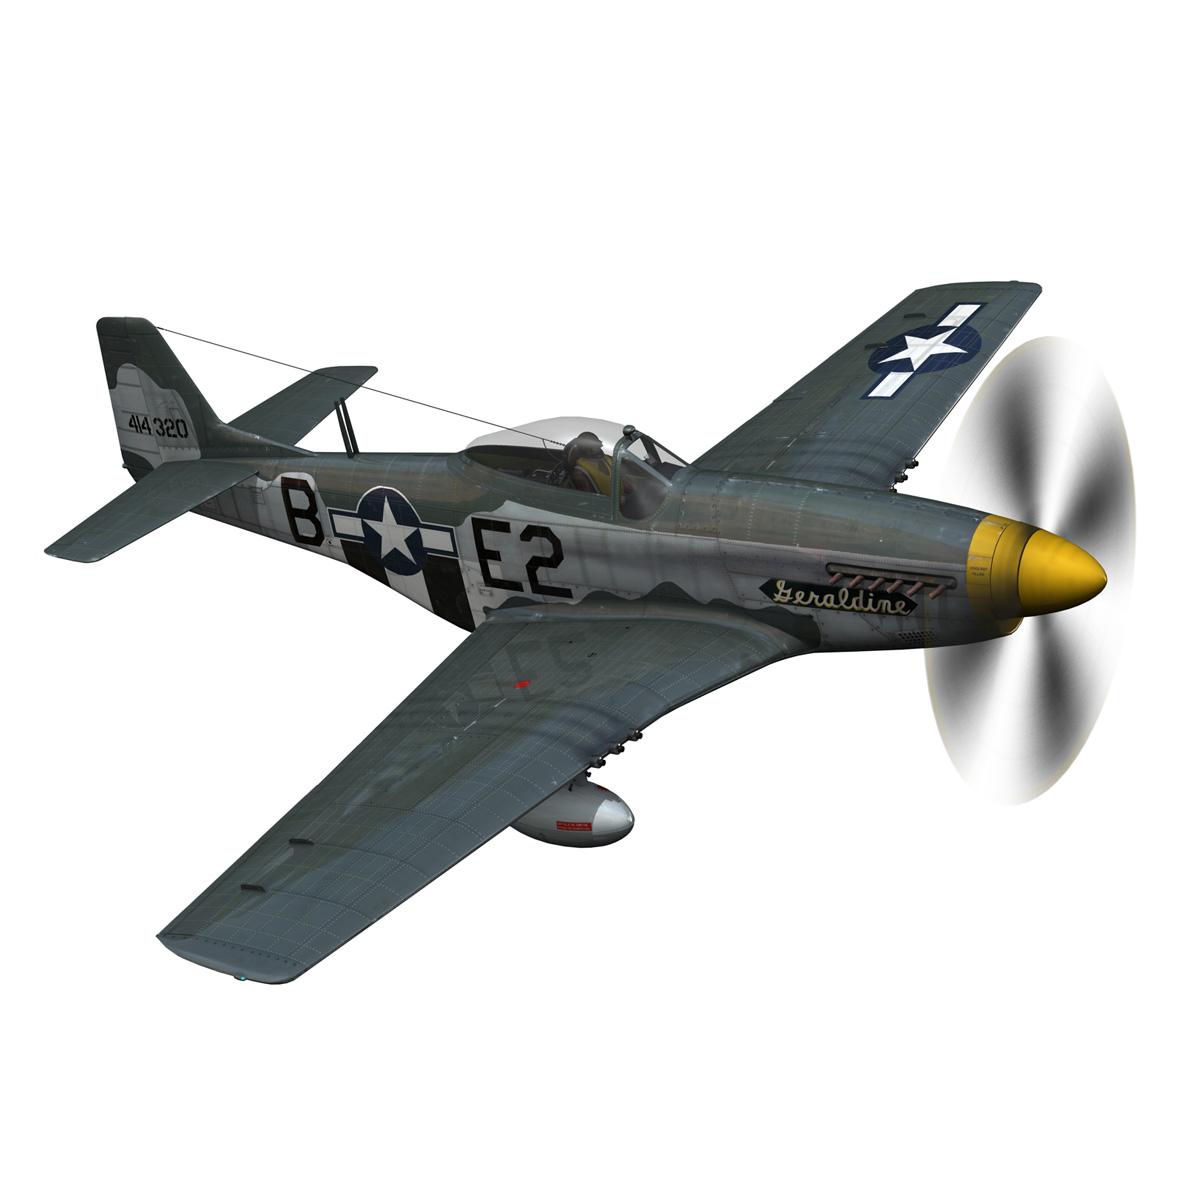 North American P-51D - Geraldine 3d model fbx c4d lwo obj 265944